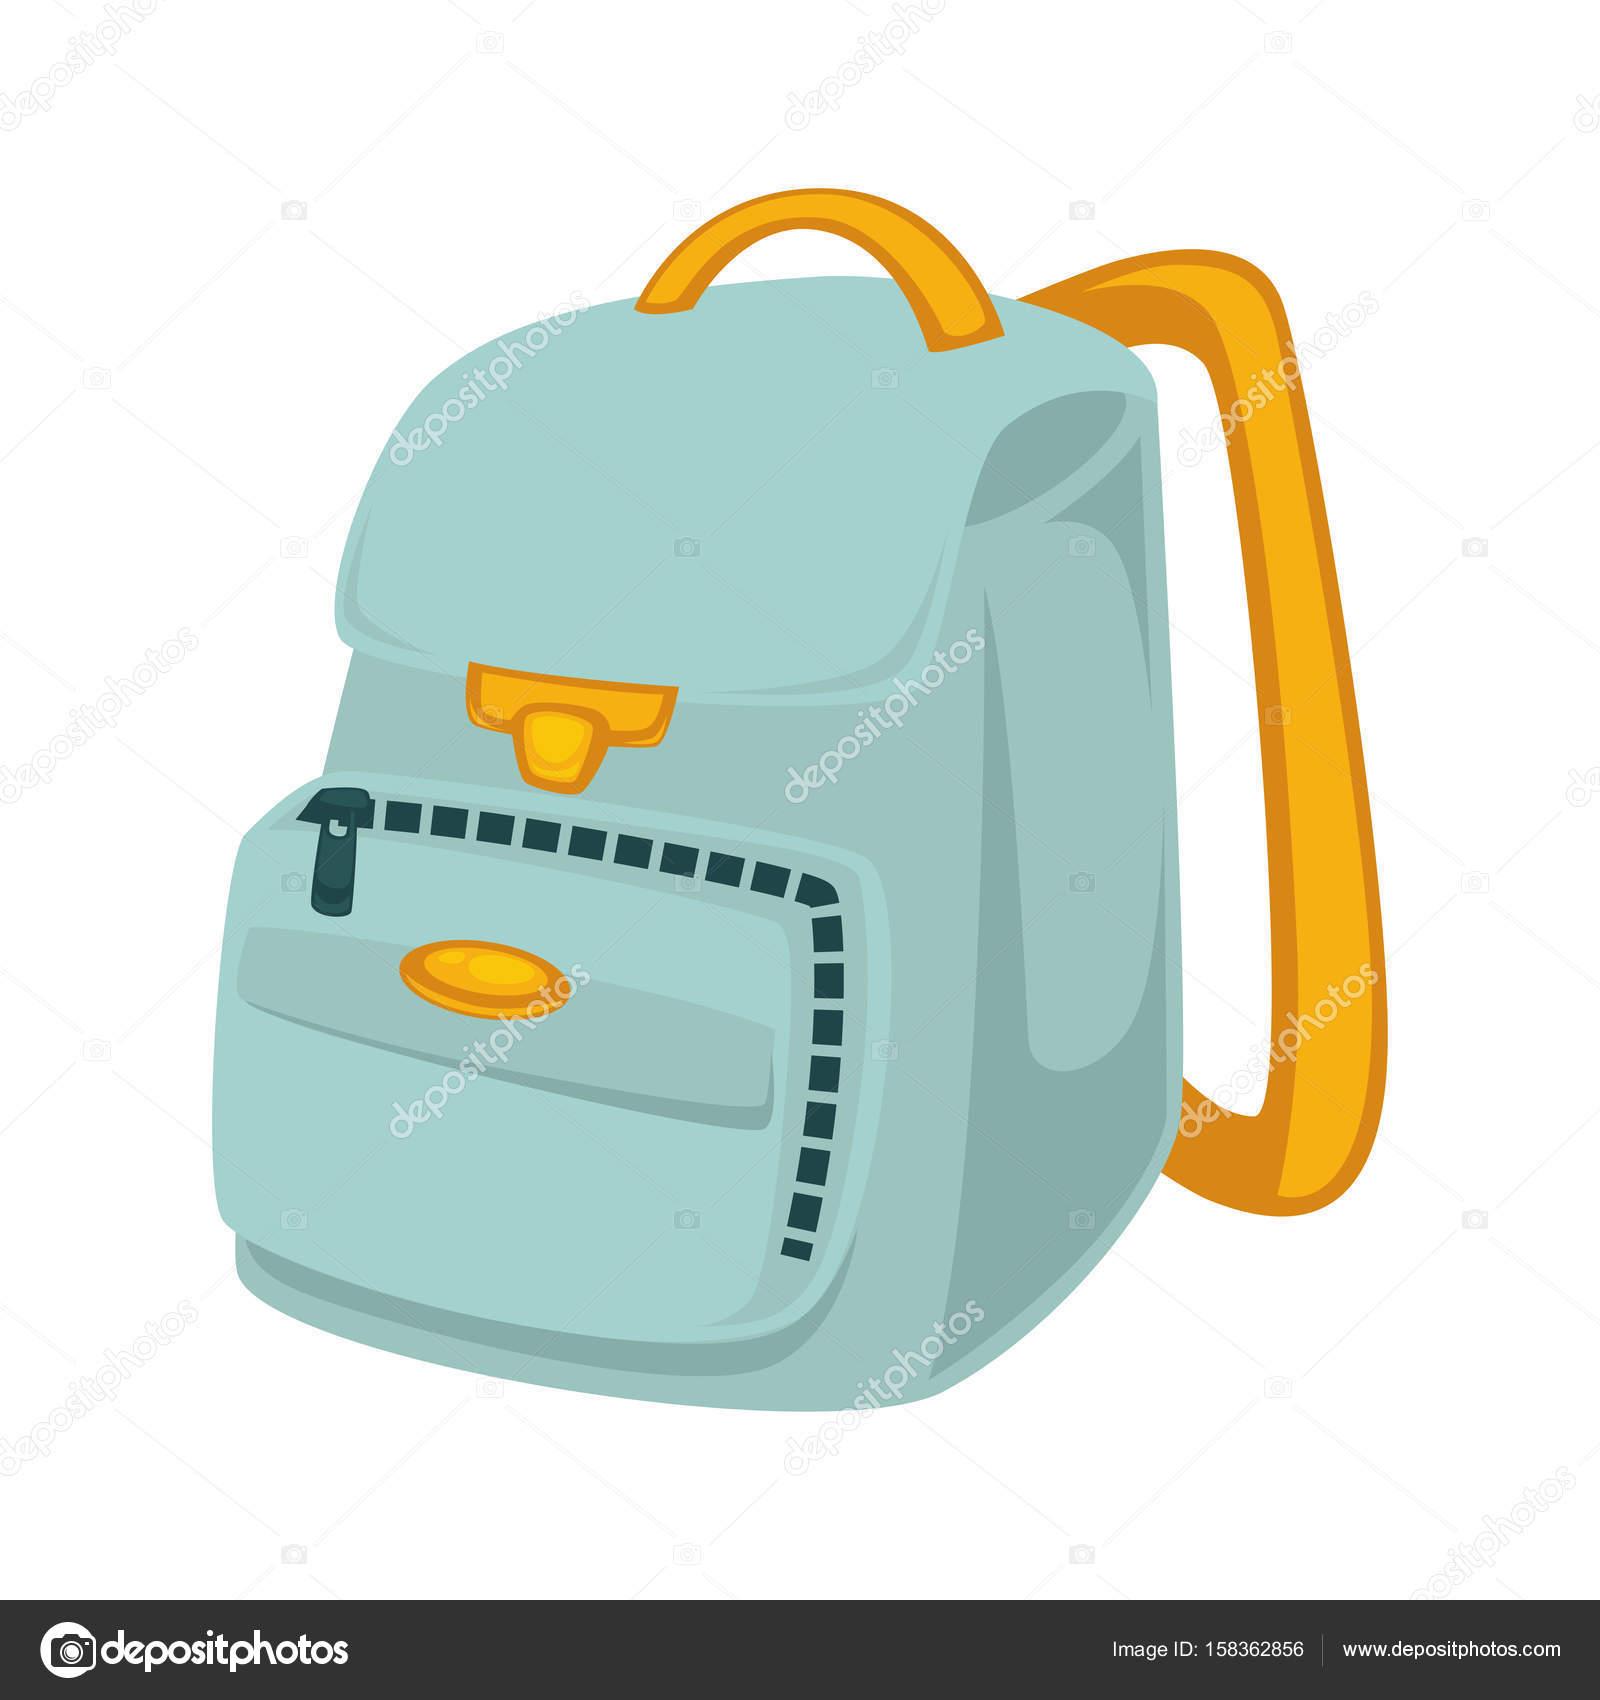 165e211eb0 Backpack σχολείο σε μπλε χρώμα με κίτρινη λαβή και κλιπ που απομονώνονται  σε λευκό διάνυσμα στενή επάνω εικόνα στην επίπεδη σχεδίαση. Τσάντα  κατασκευασμένη ...